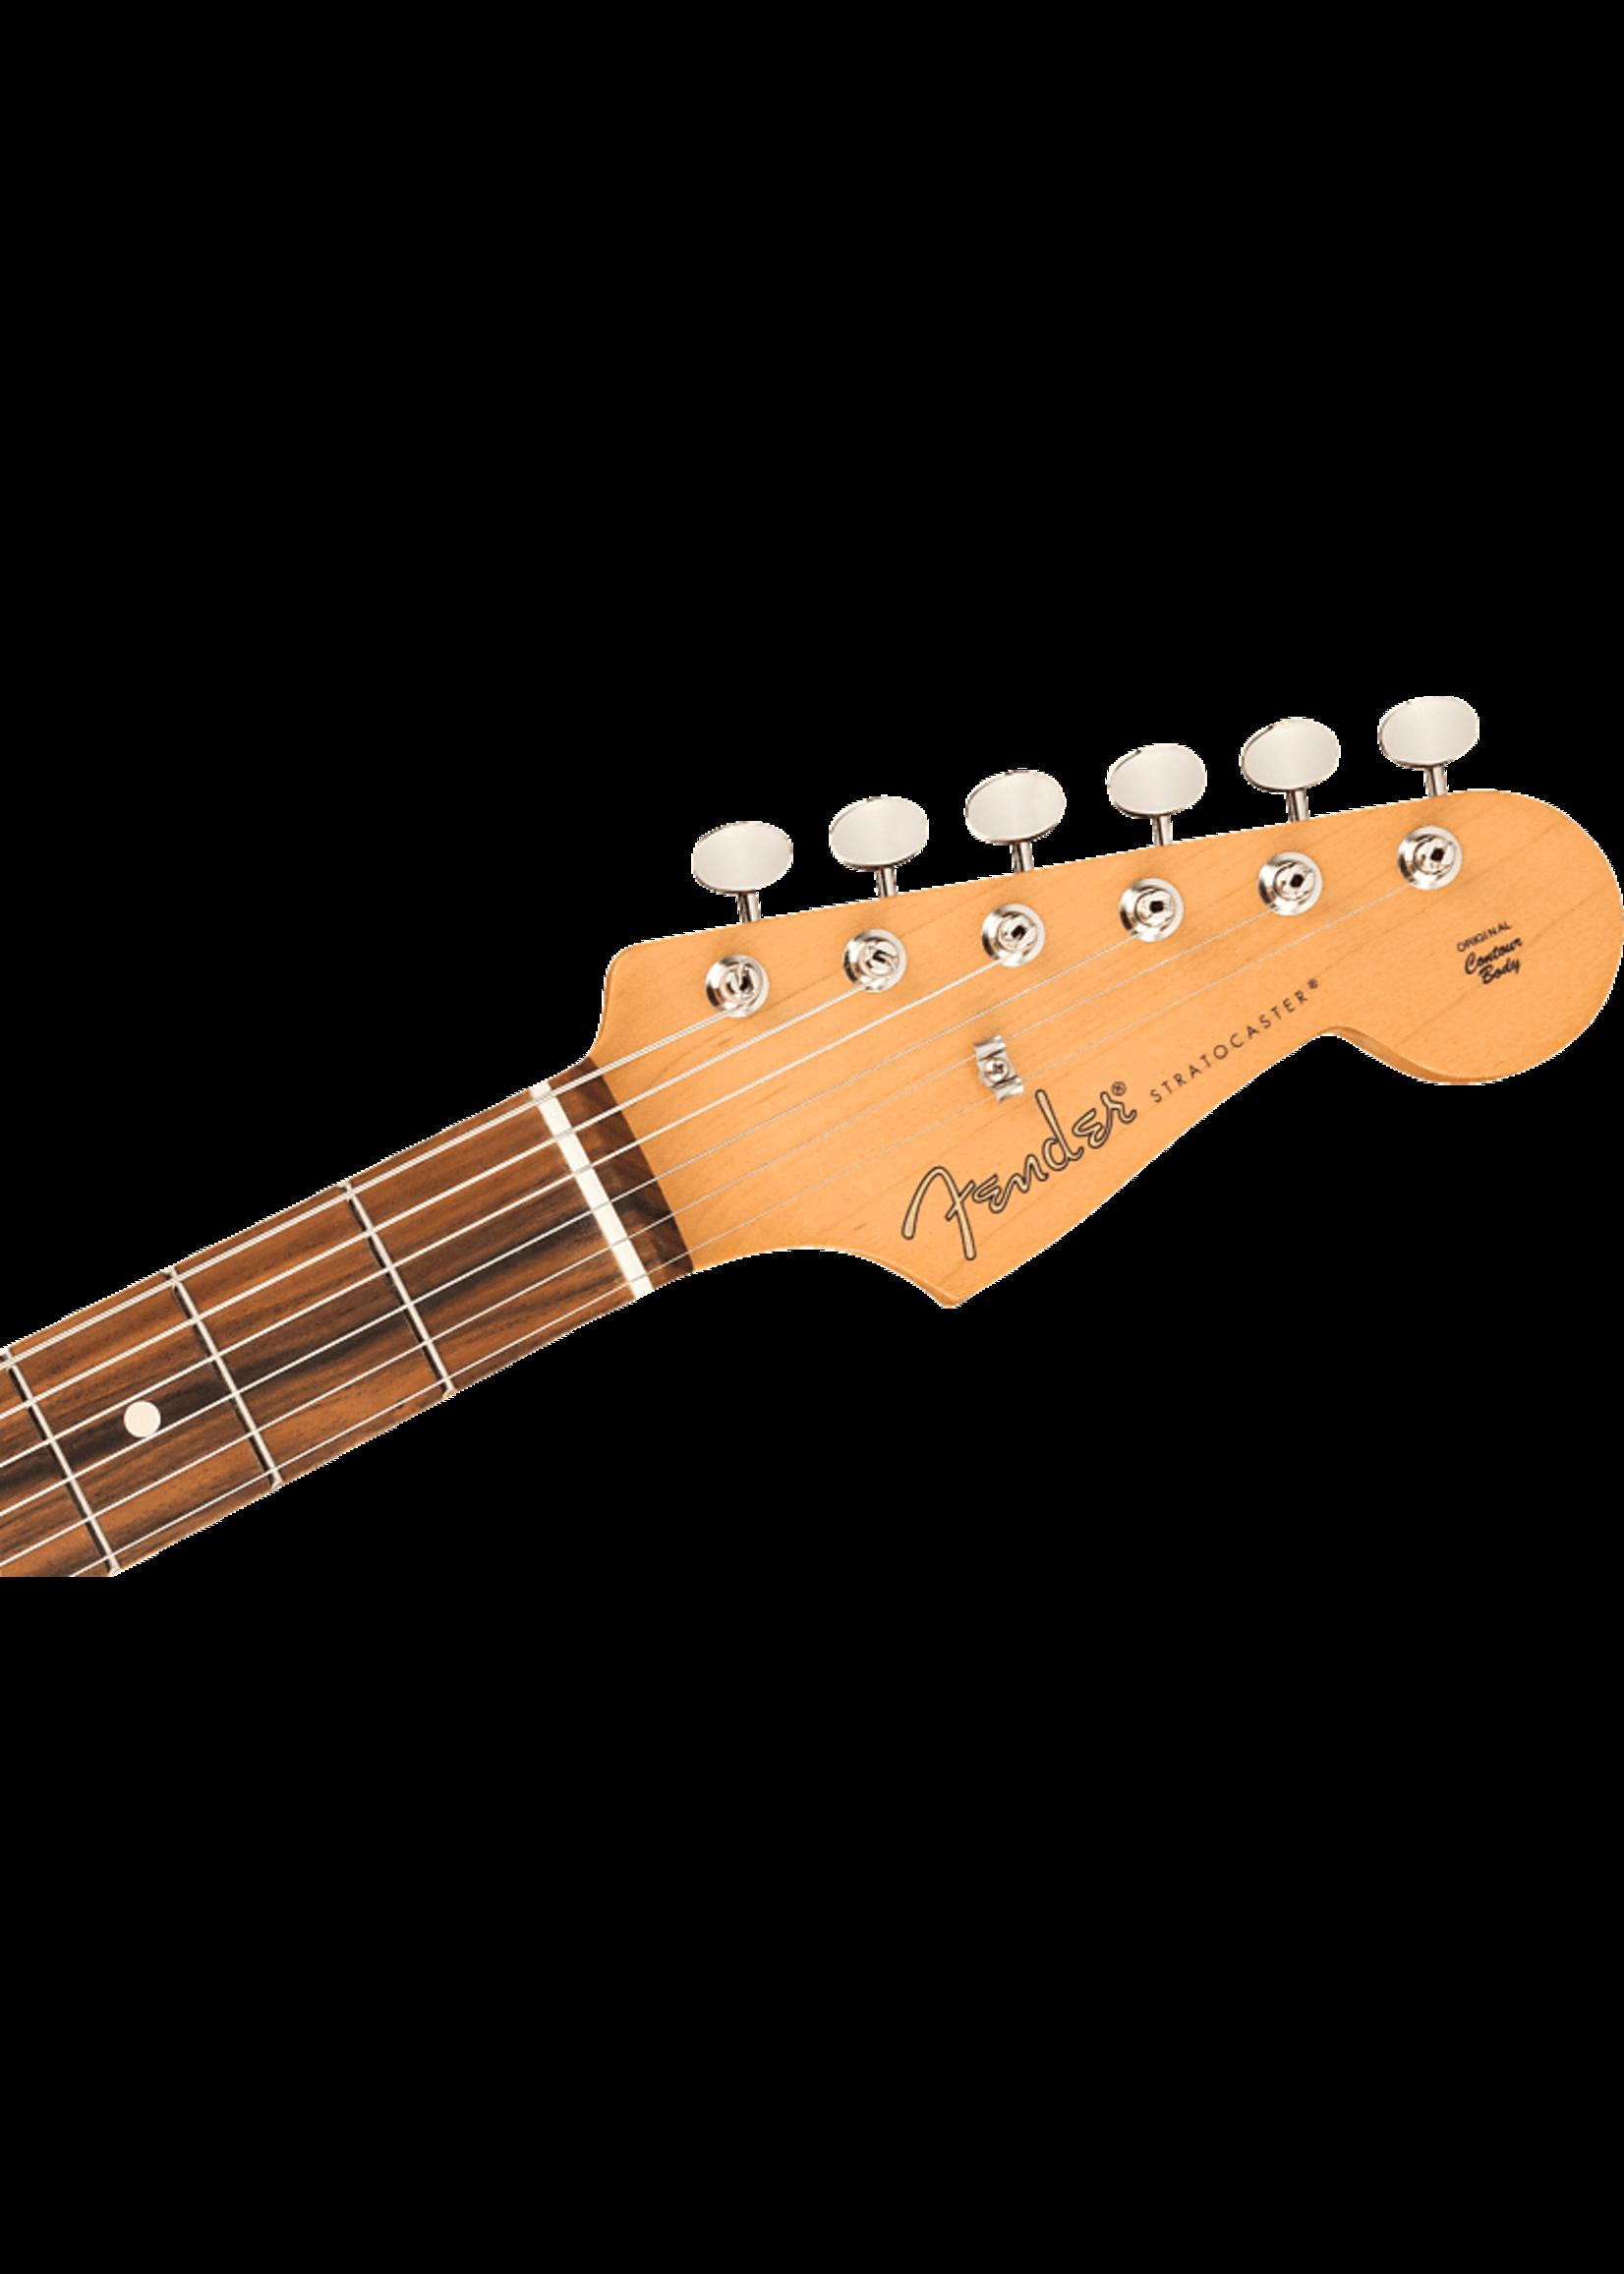 Fender Fender Noventa Strat Pao Ferro Crimson Red Transparent